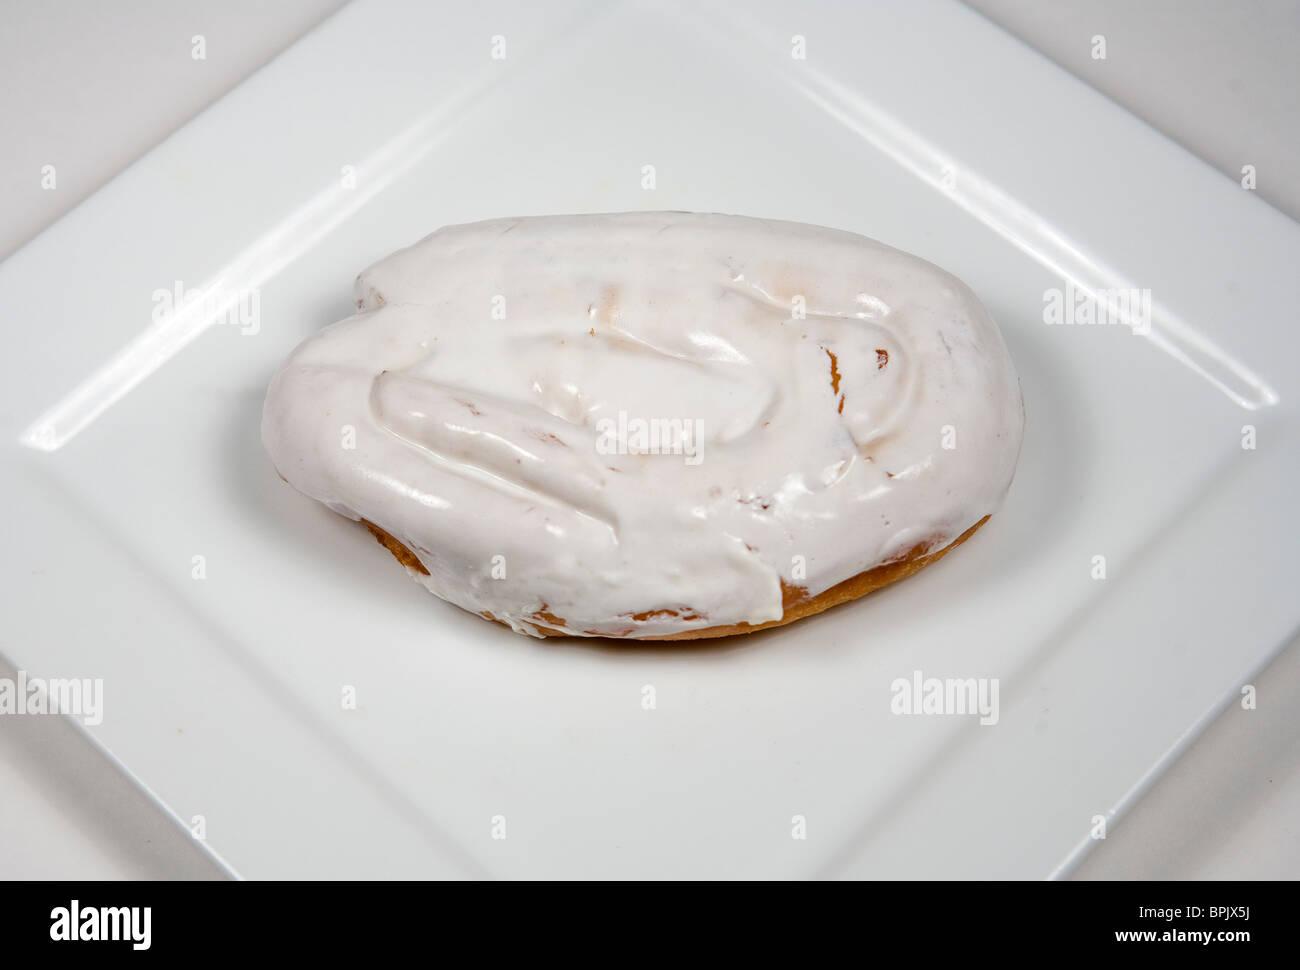 Tastykake iced honey bun. - Stock Image